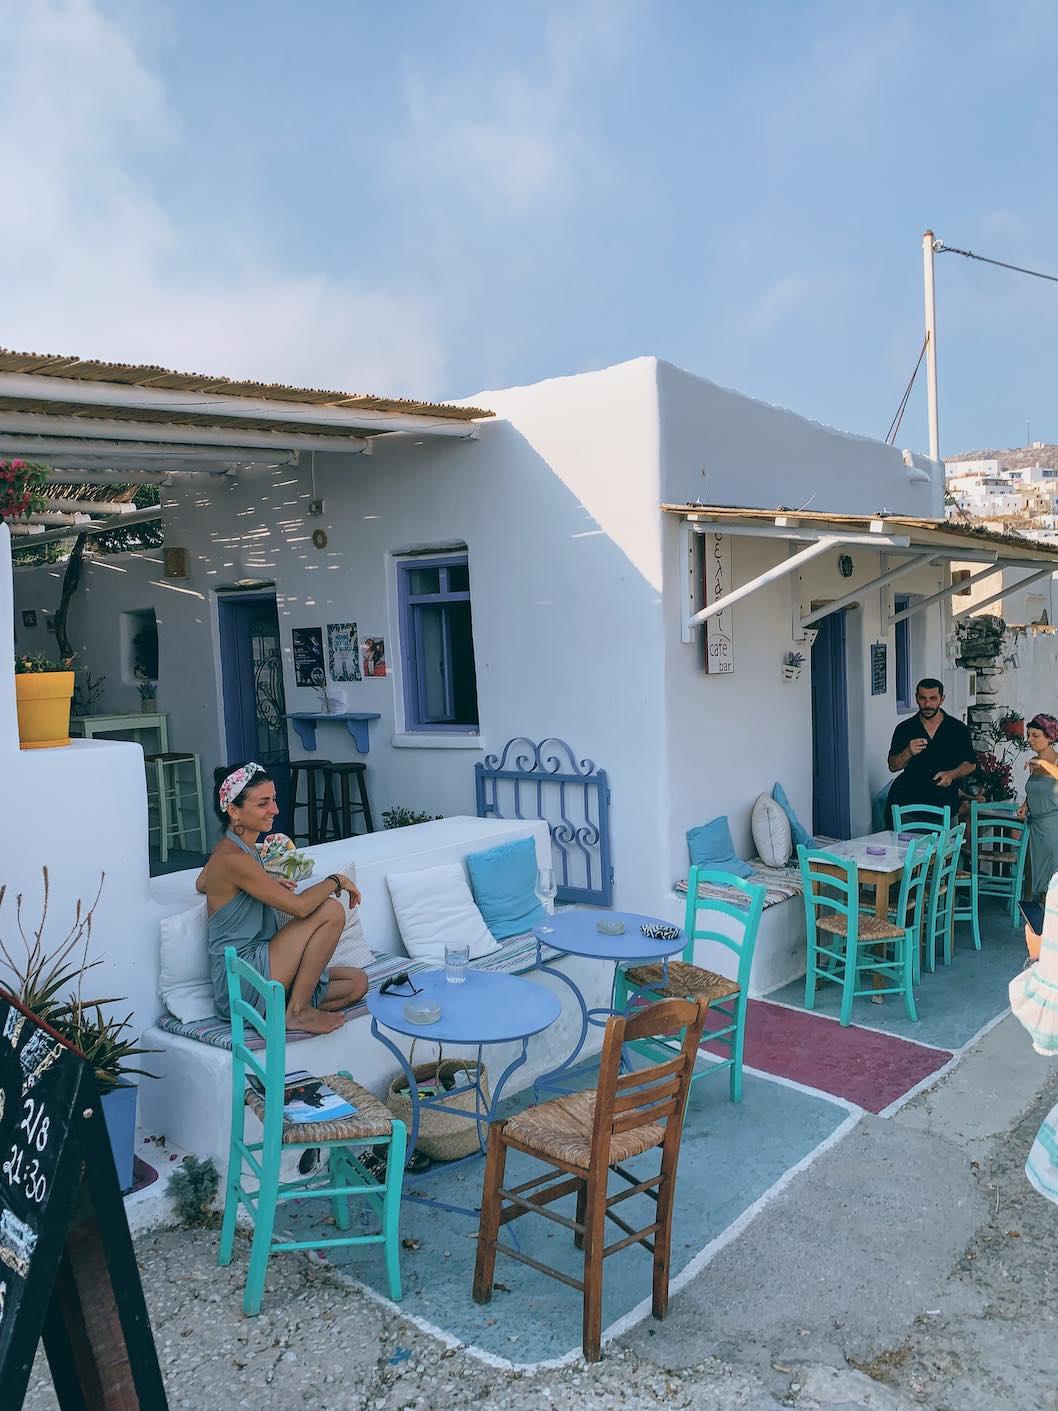 Seladi bar in Tholaria, Amorgos